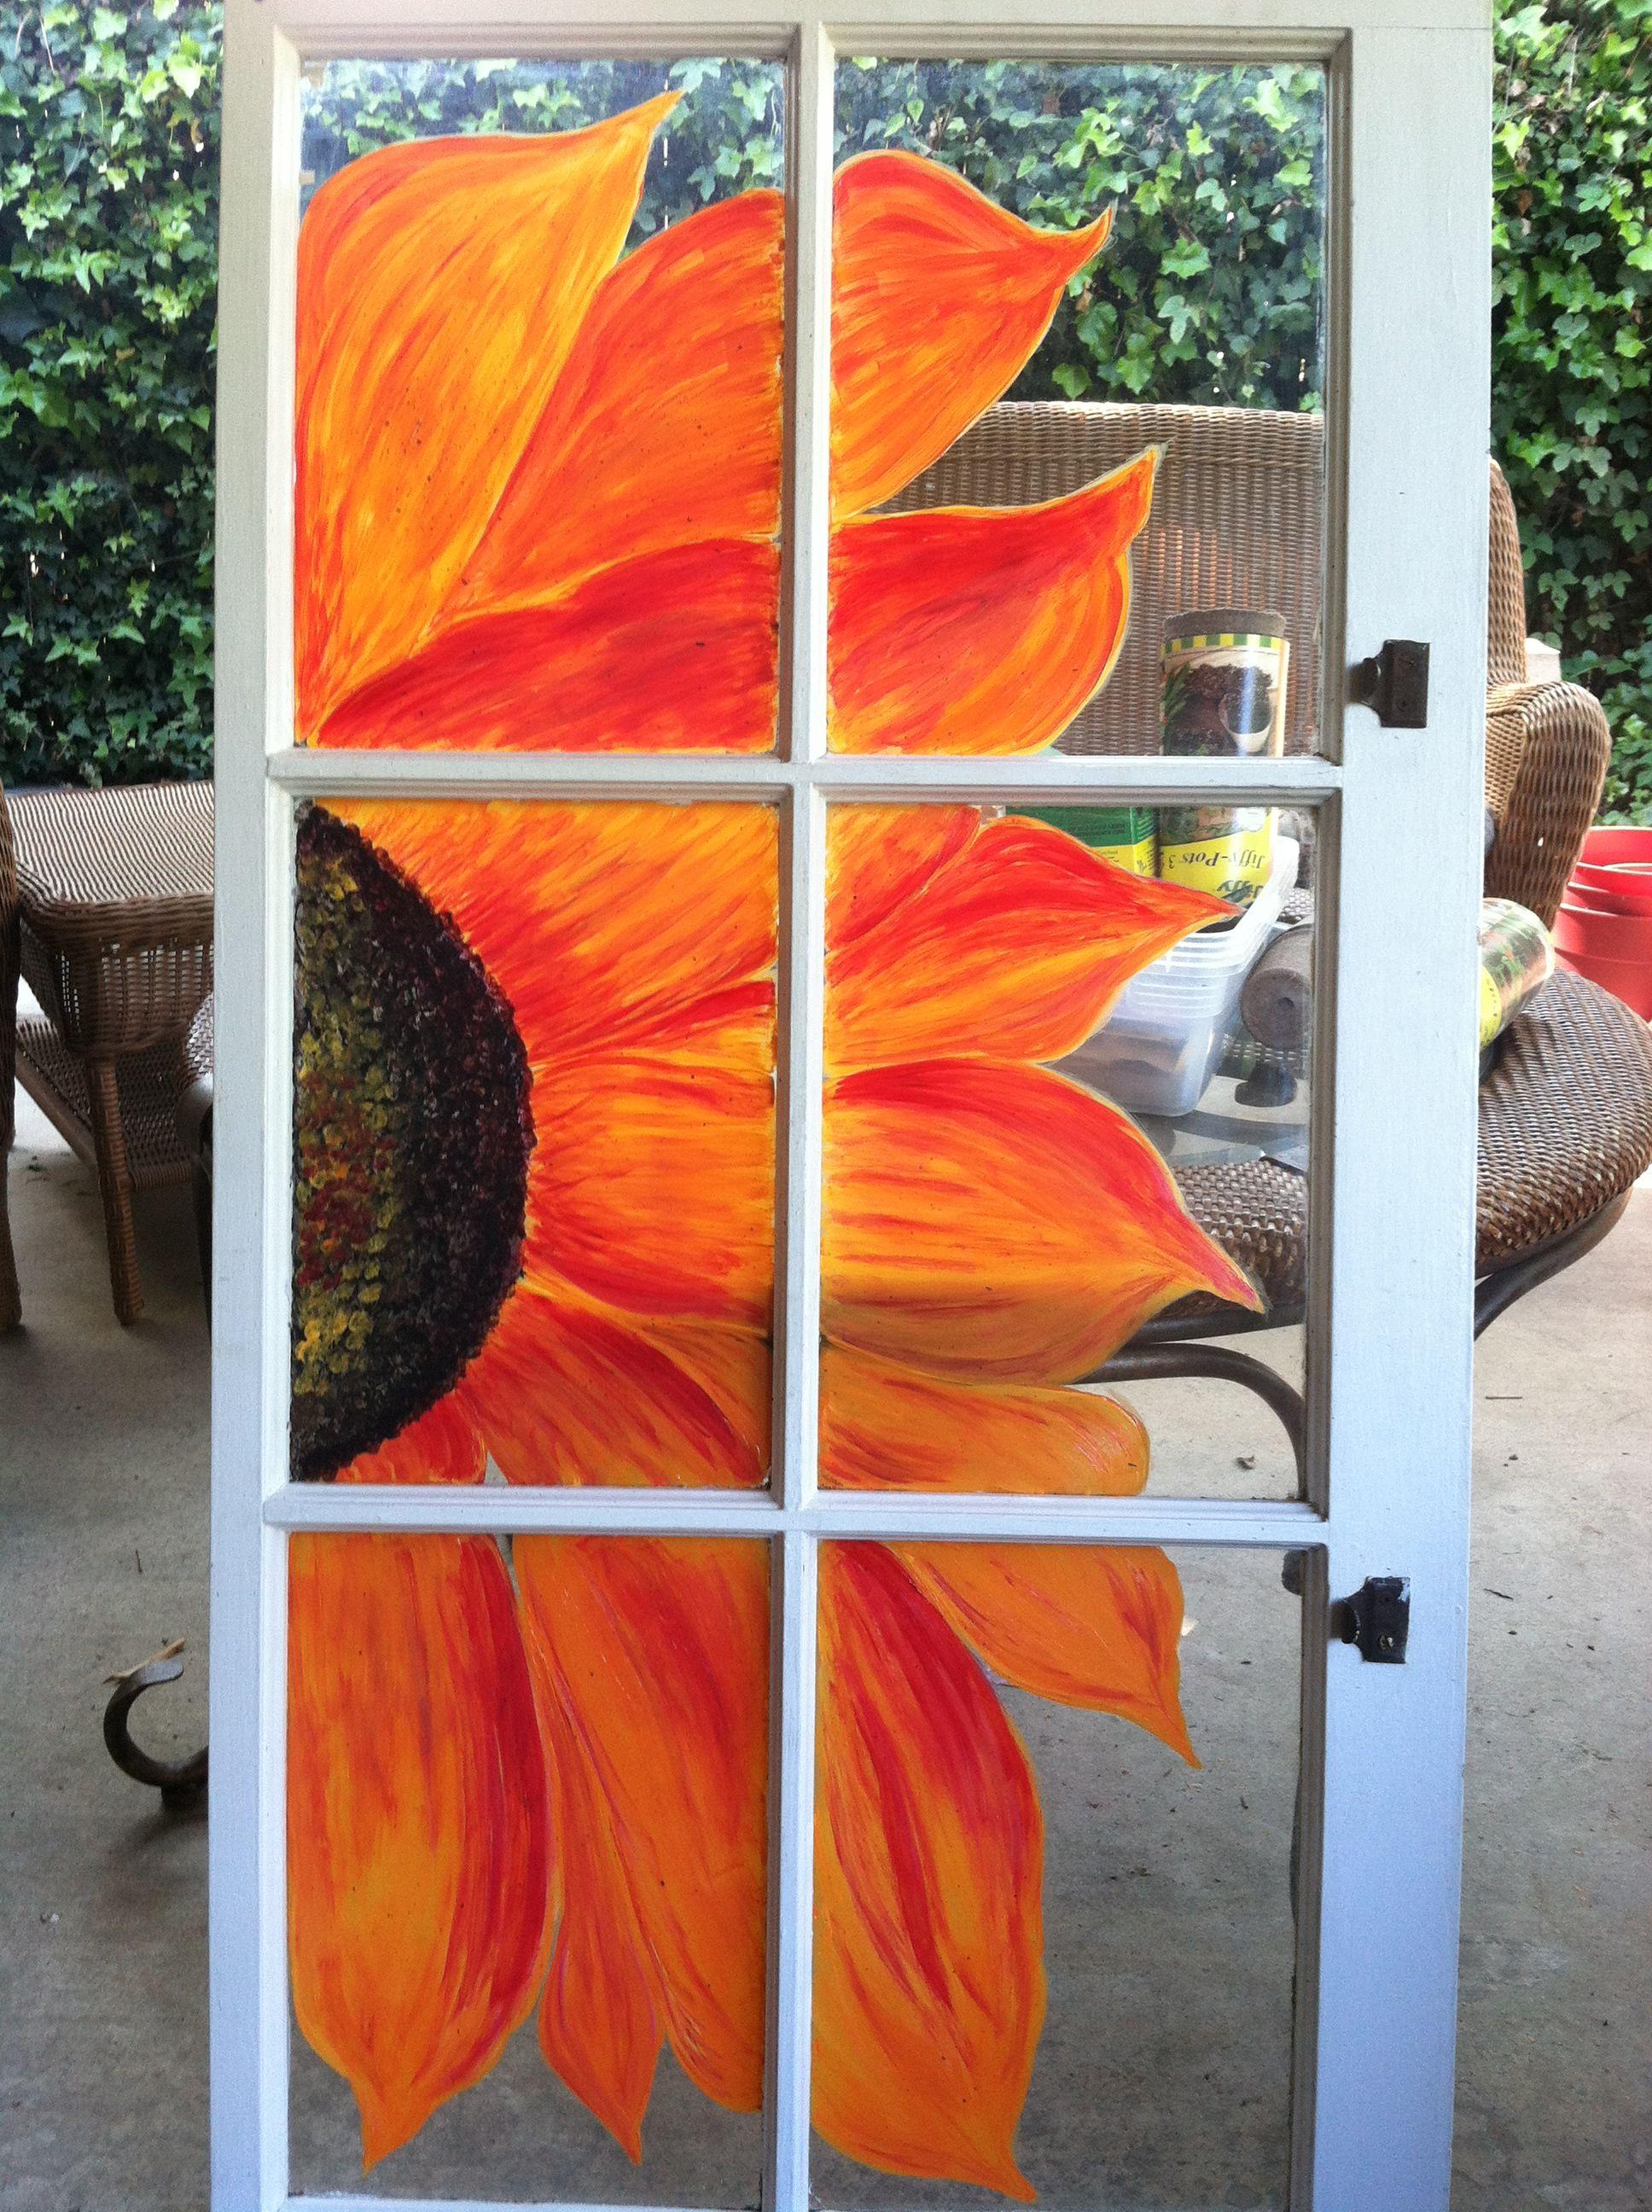 6 pane window ideas  orange and red sunflower painted window pane acrylic windows